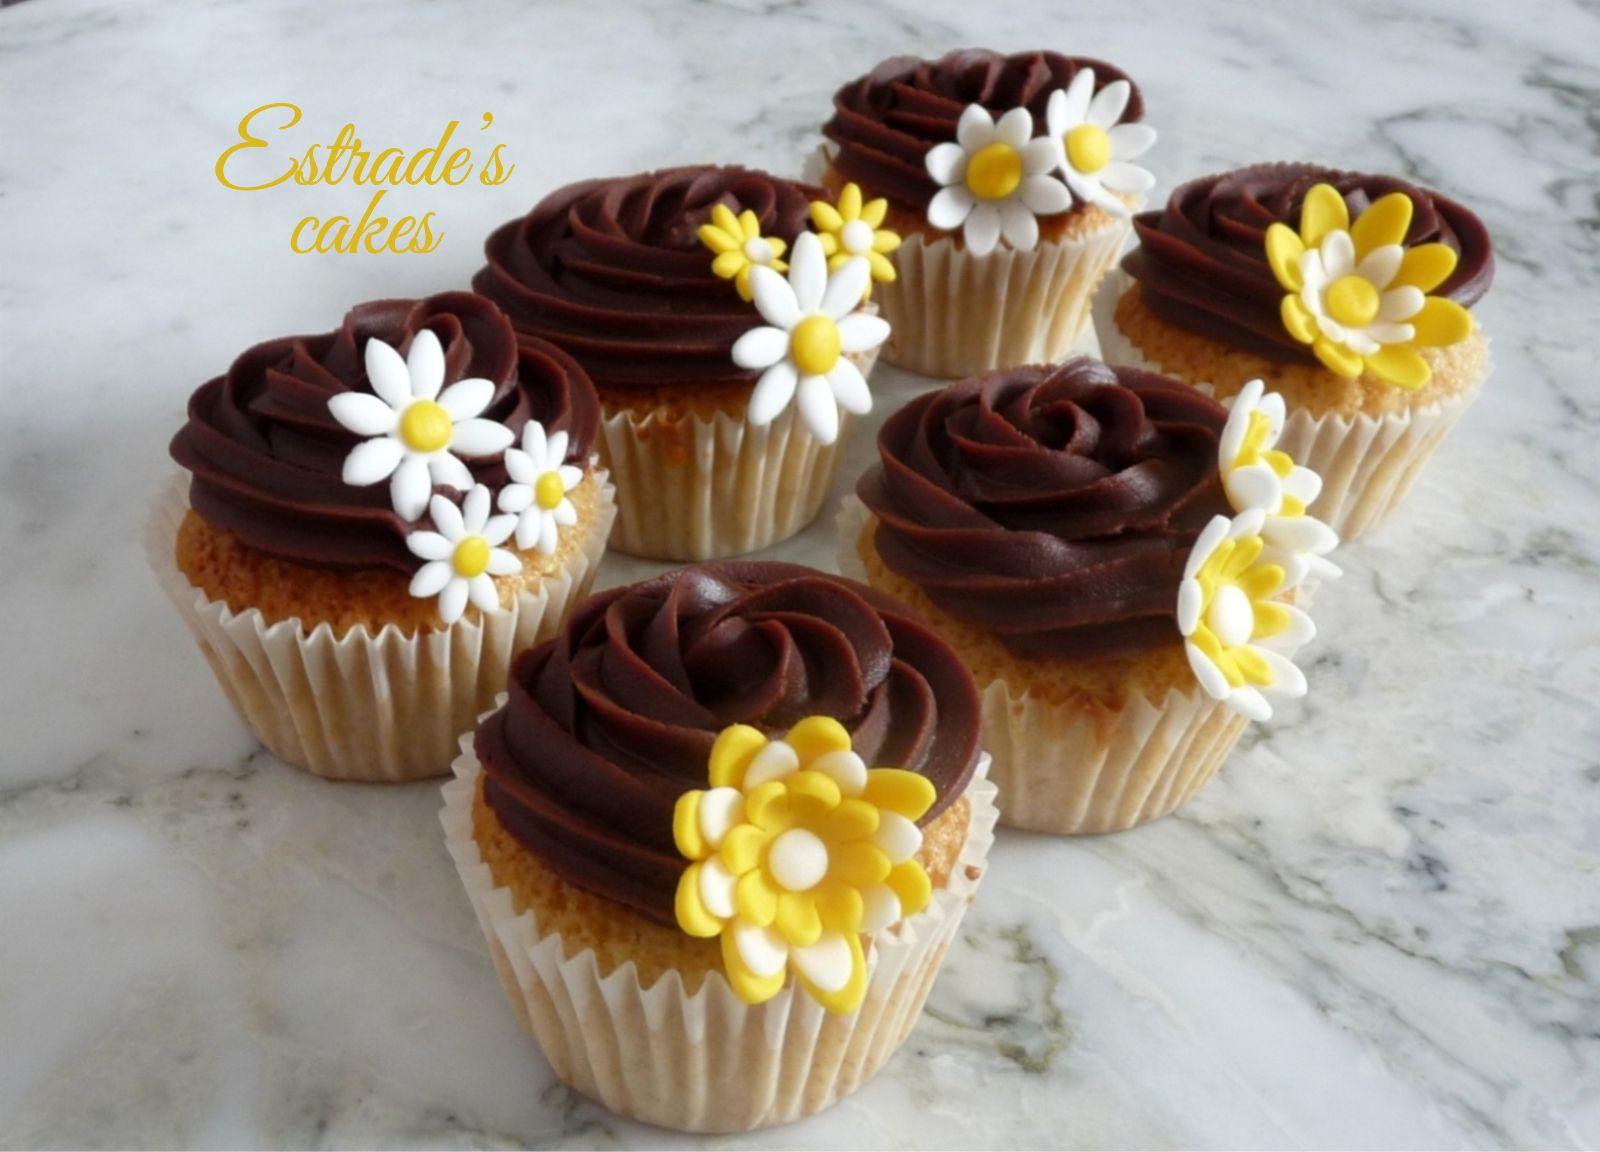 cupcakes de almendra con ganache de chocolate decorado con flores - 1